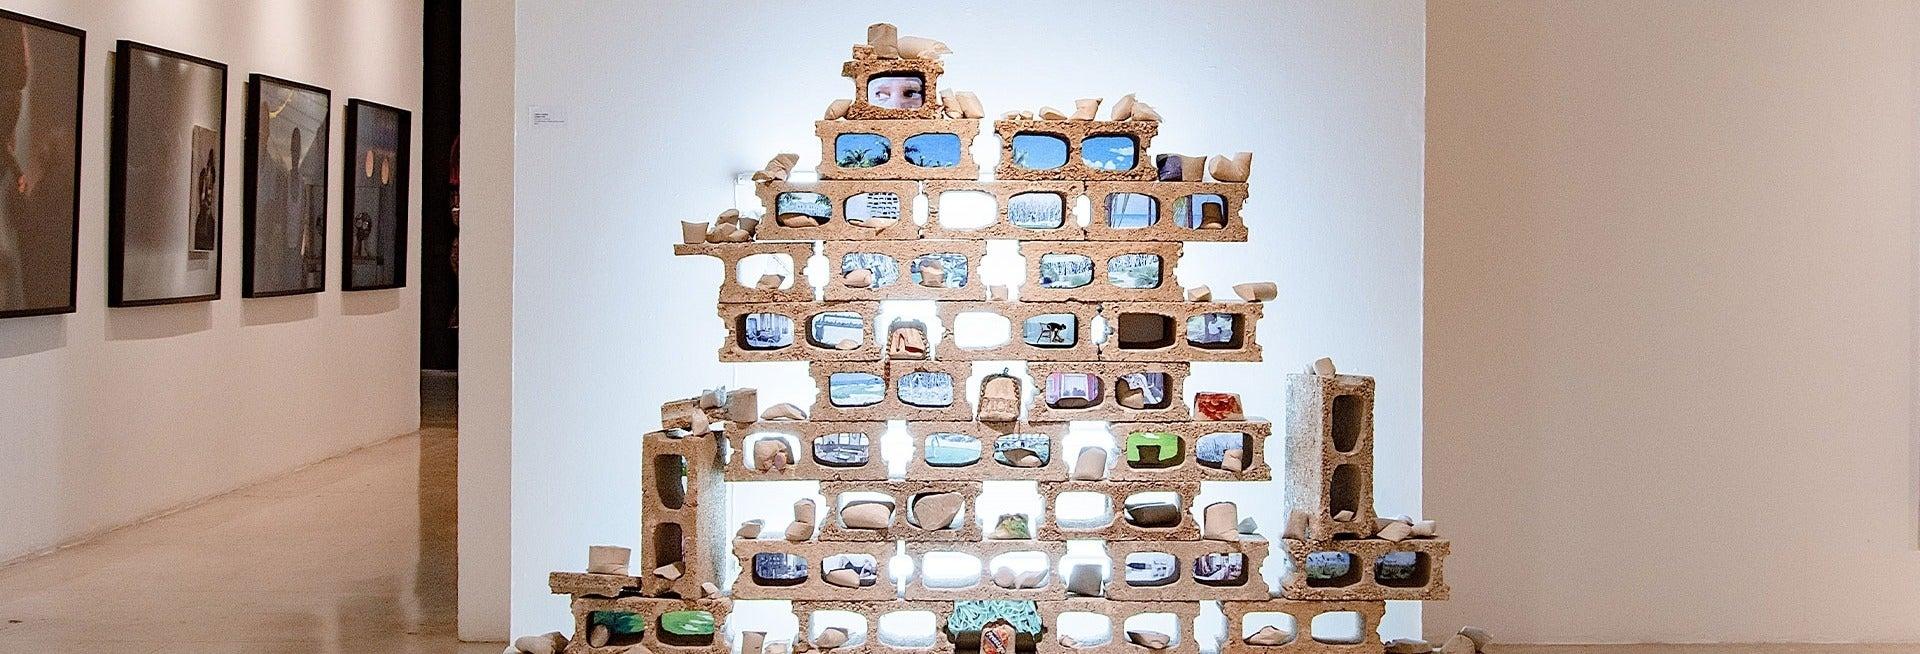 Tour delle gallerie d'arte di Kingston